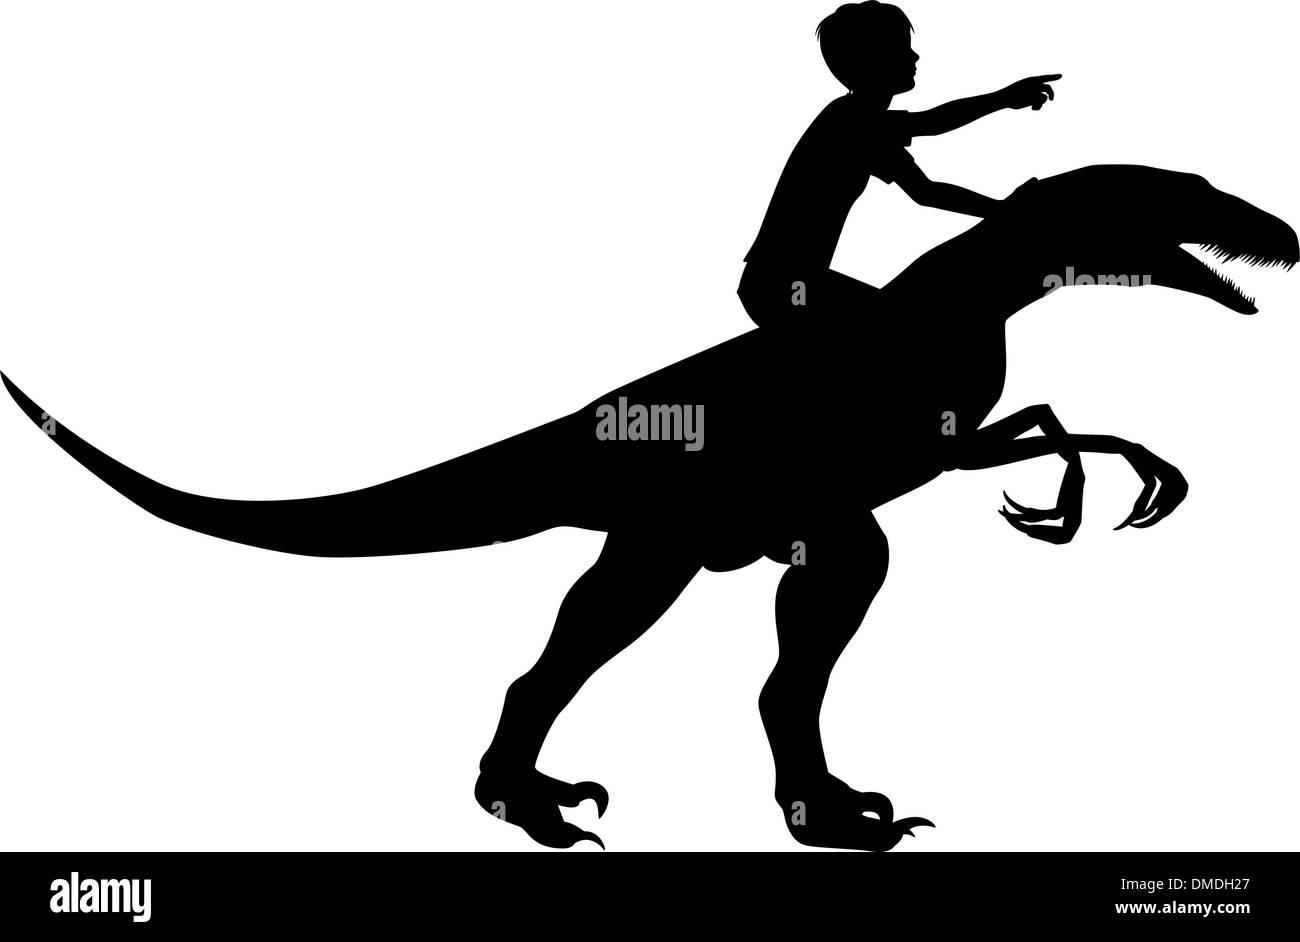 Boy riding raptor - Stock Image